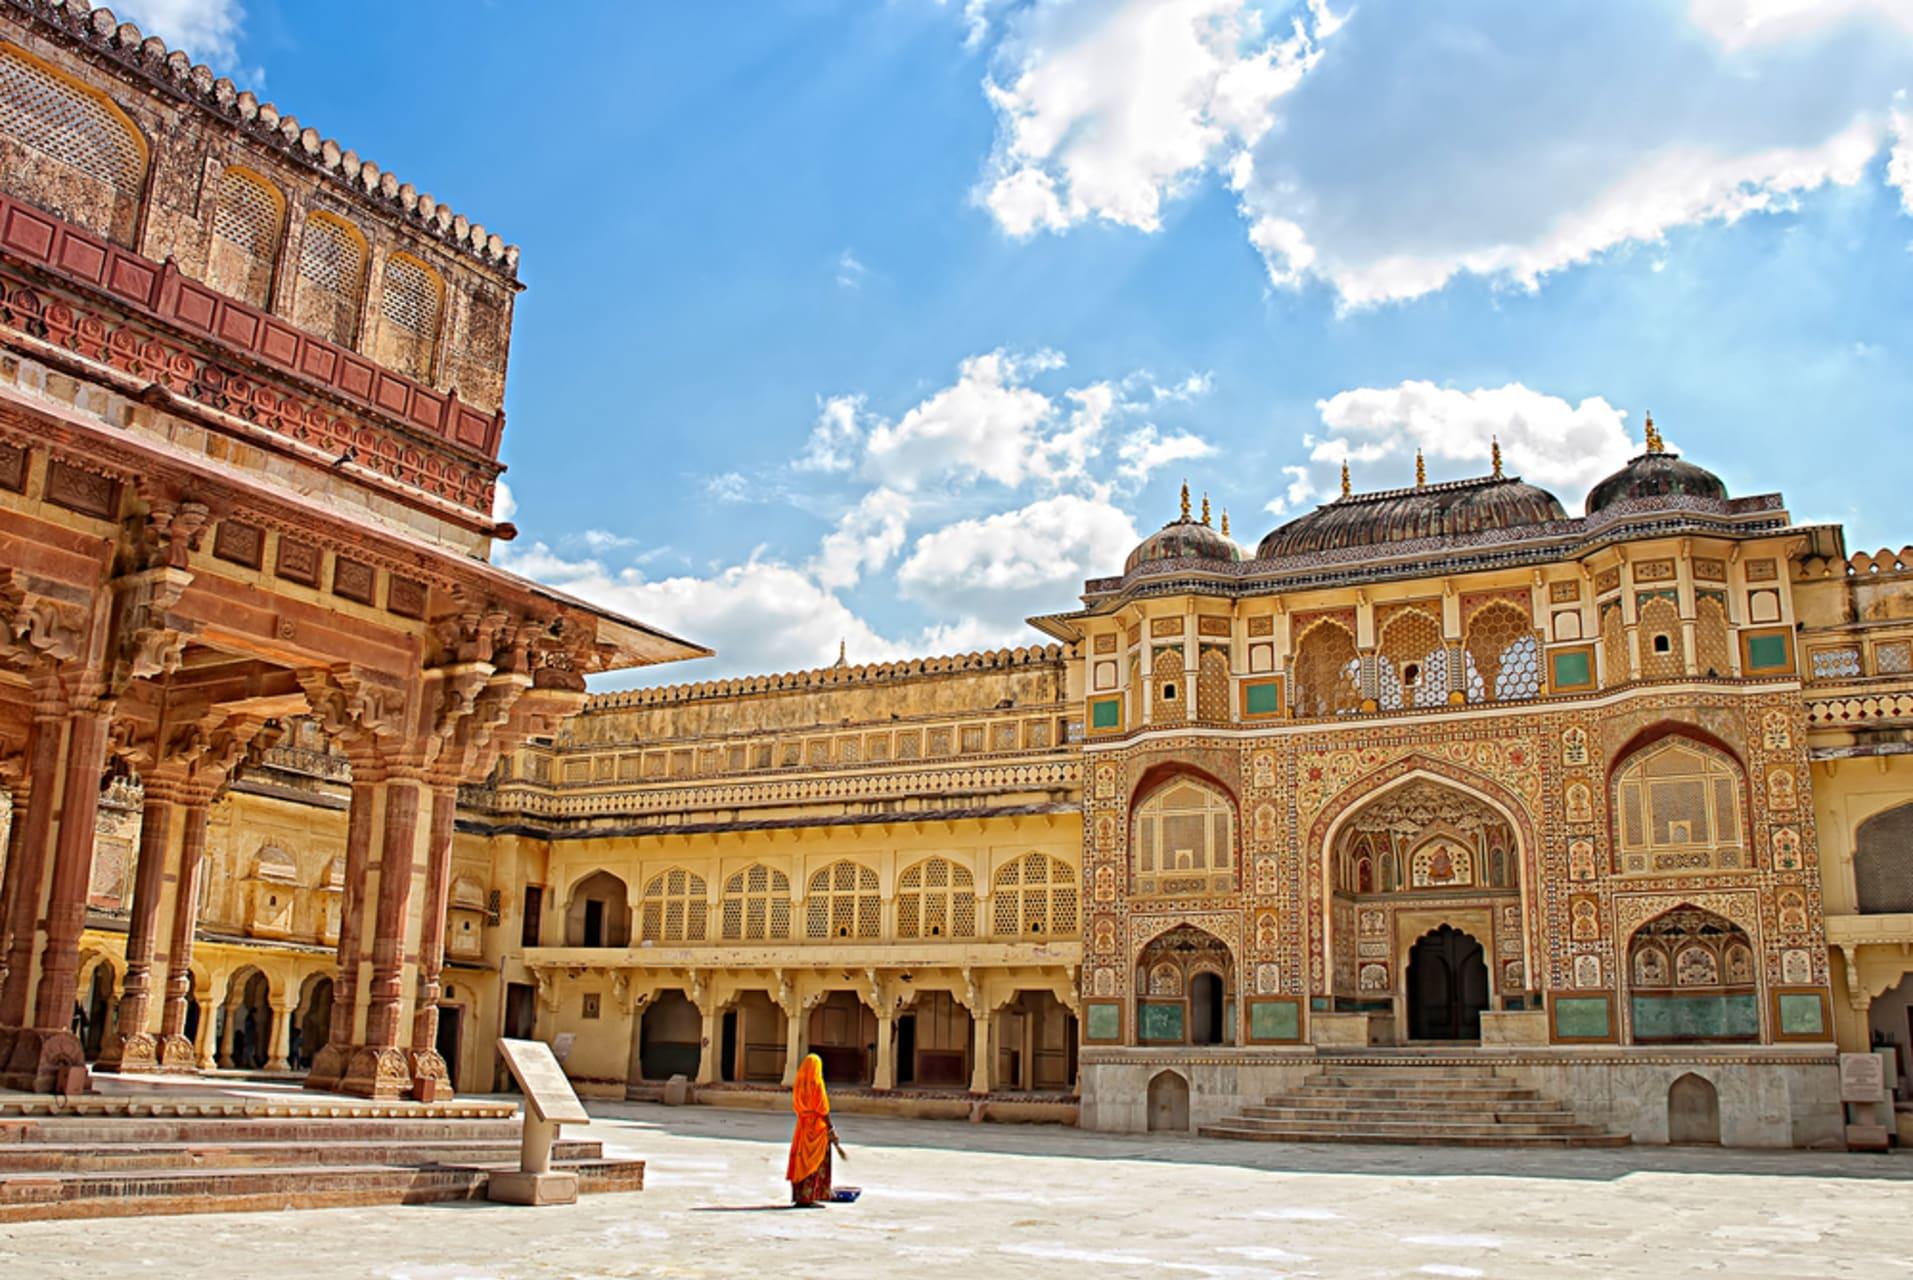 Jaipur - Amber Fort - Tour of the Jewel of Jaipur